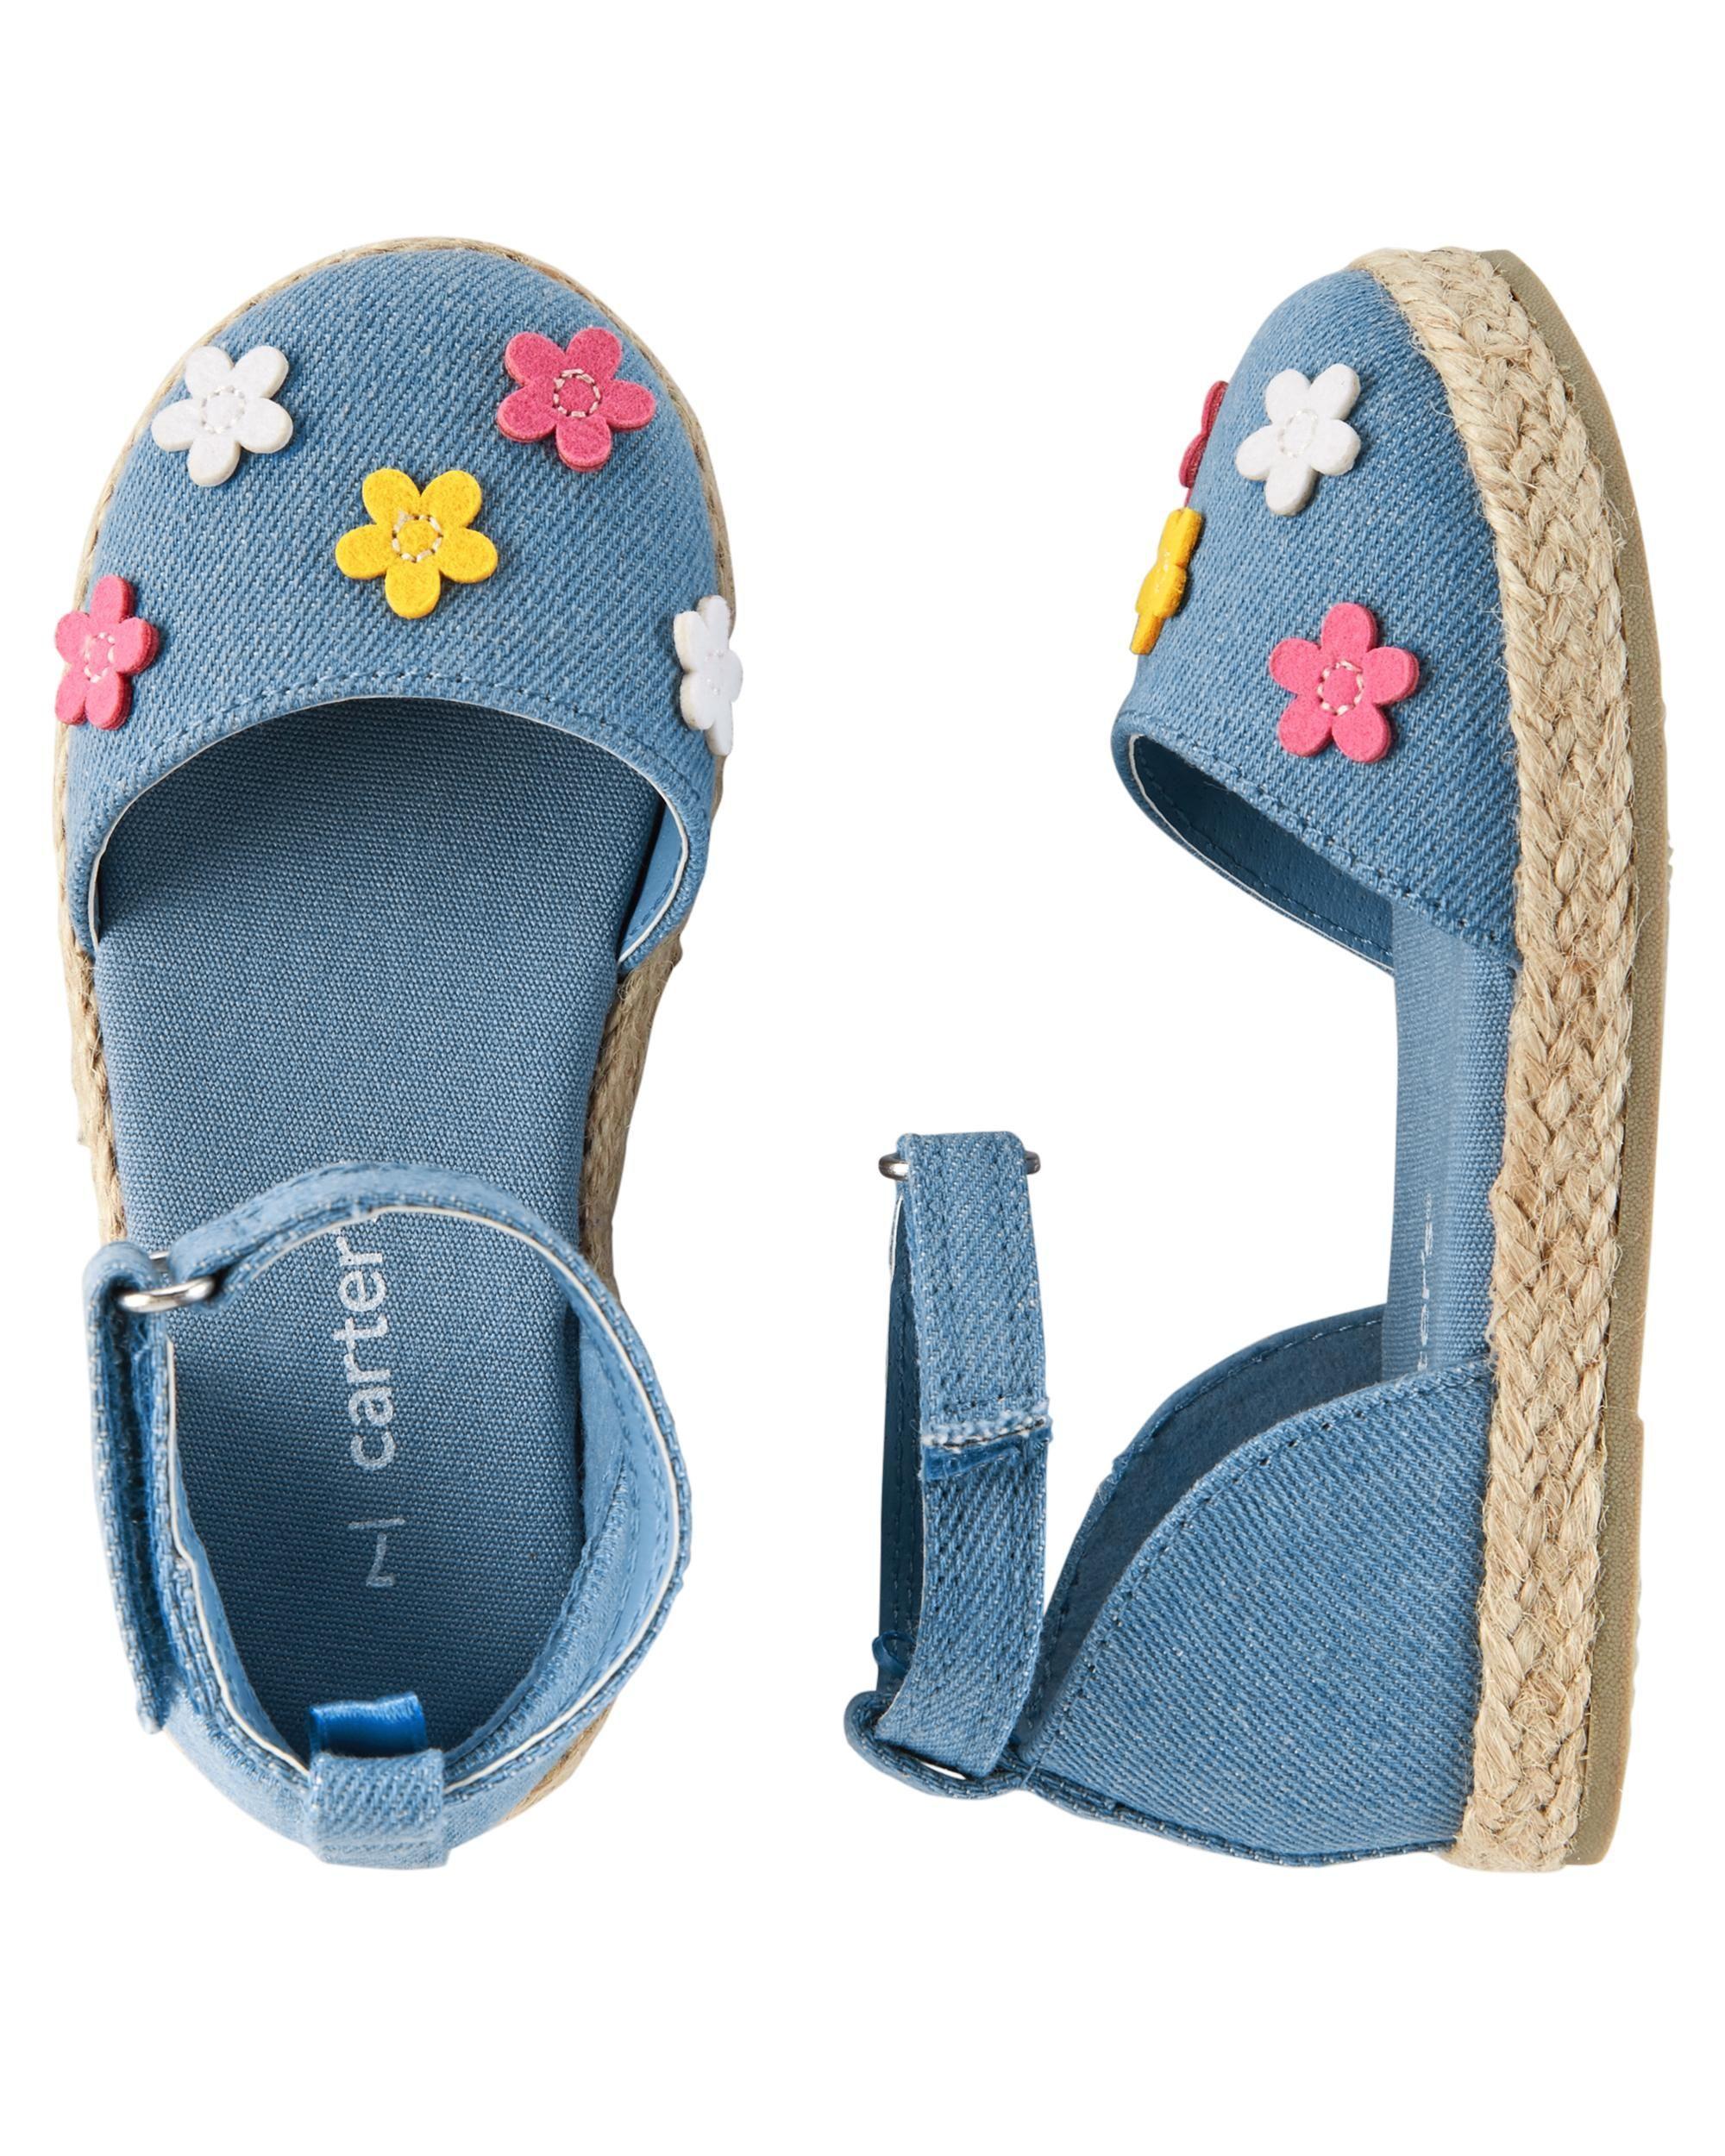 ccb40347f Toddler Girl Carter s Espadrille Sandals